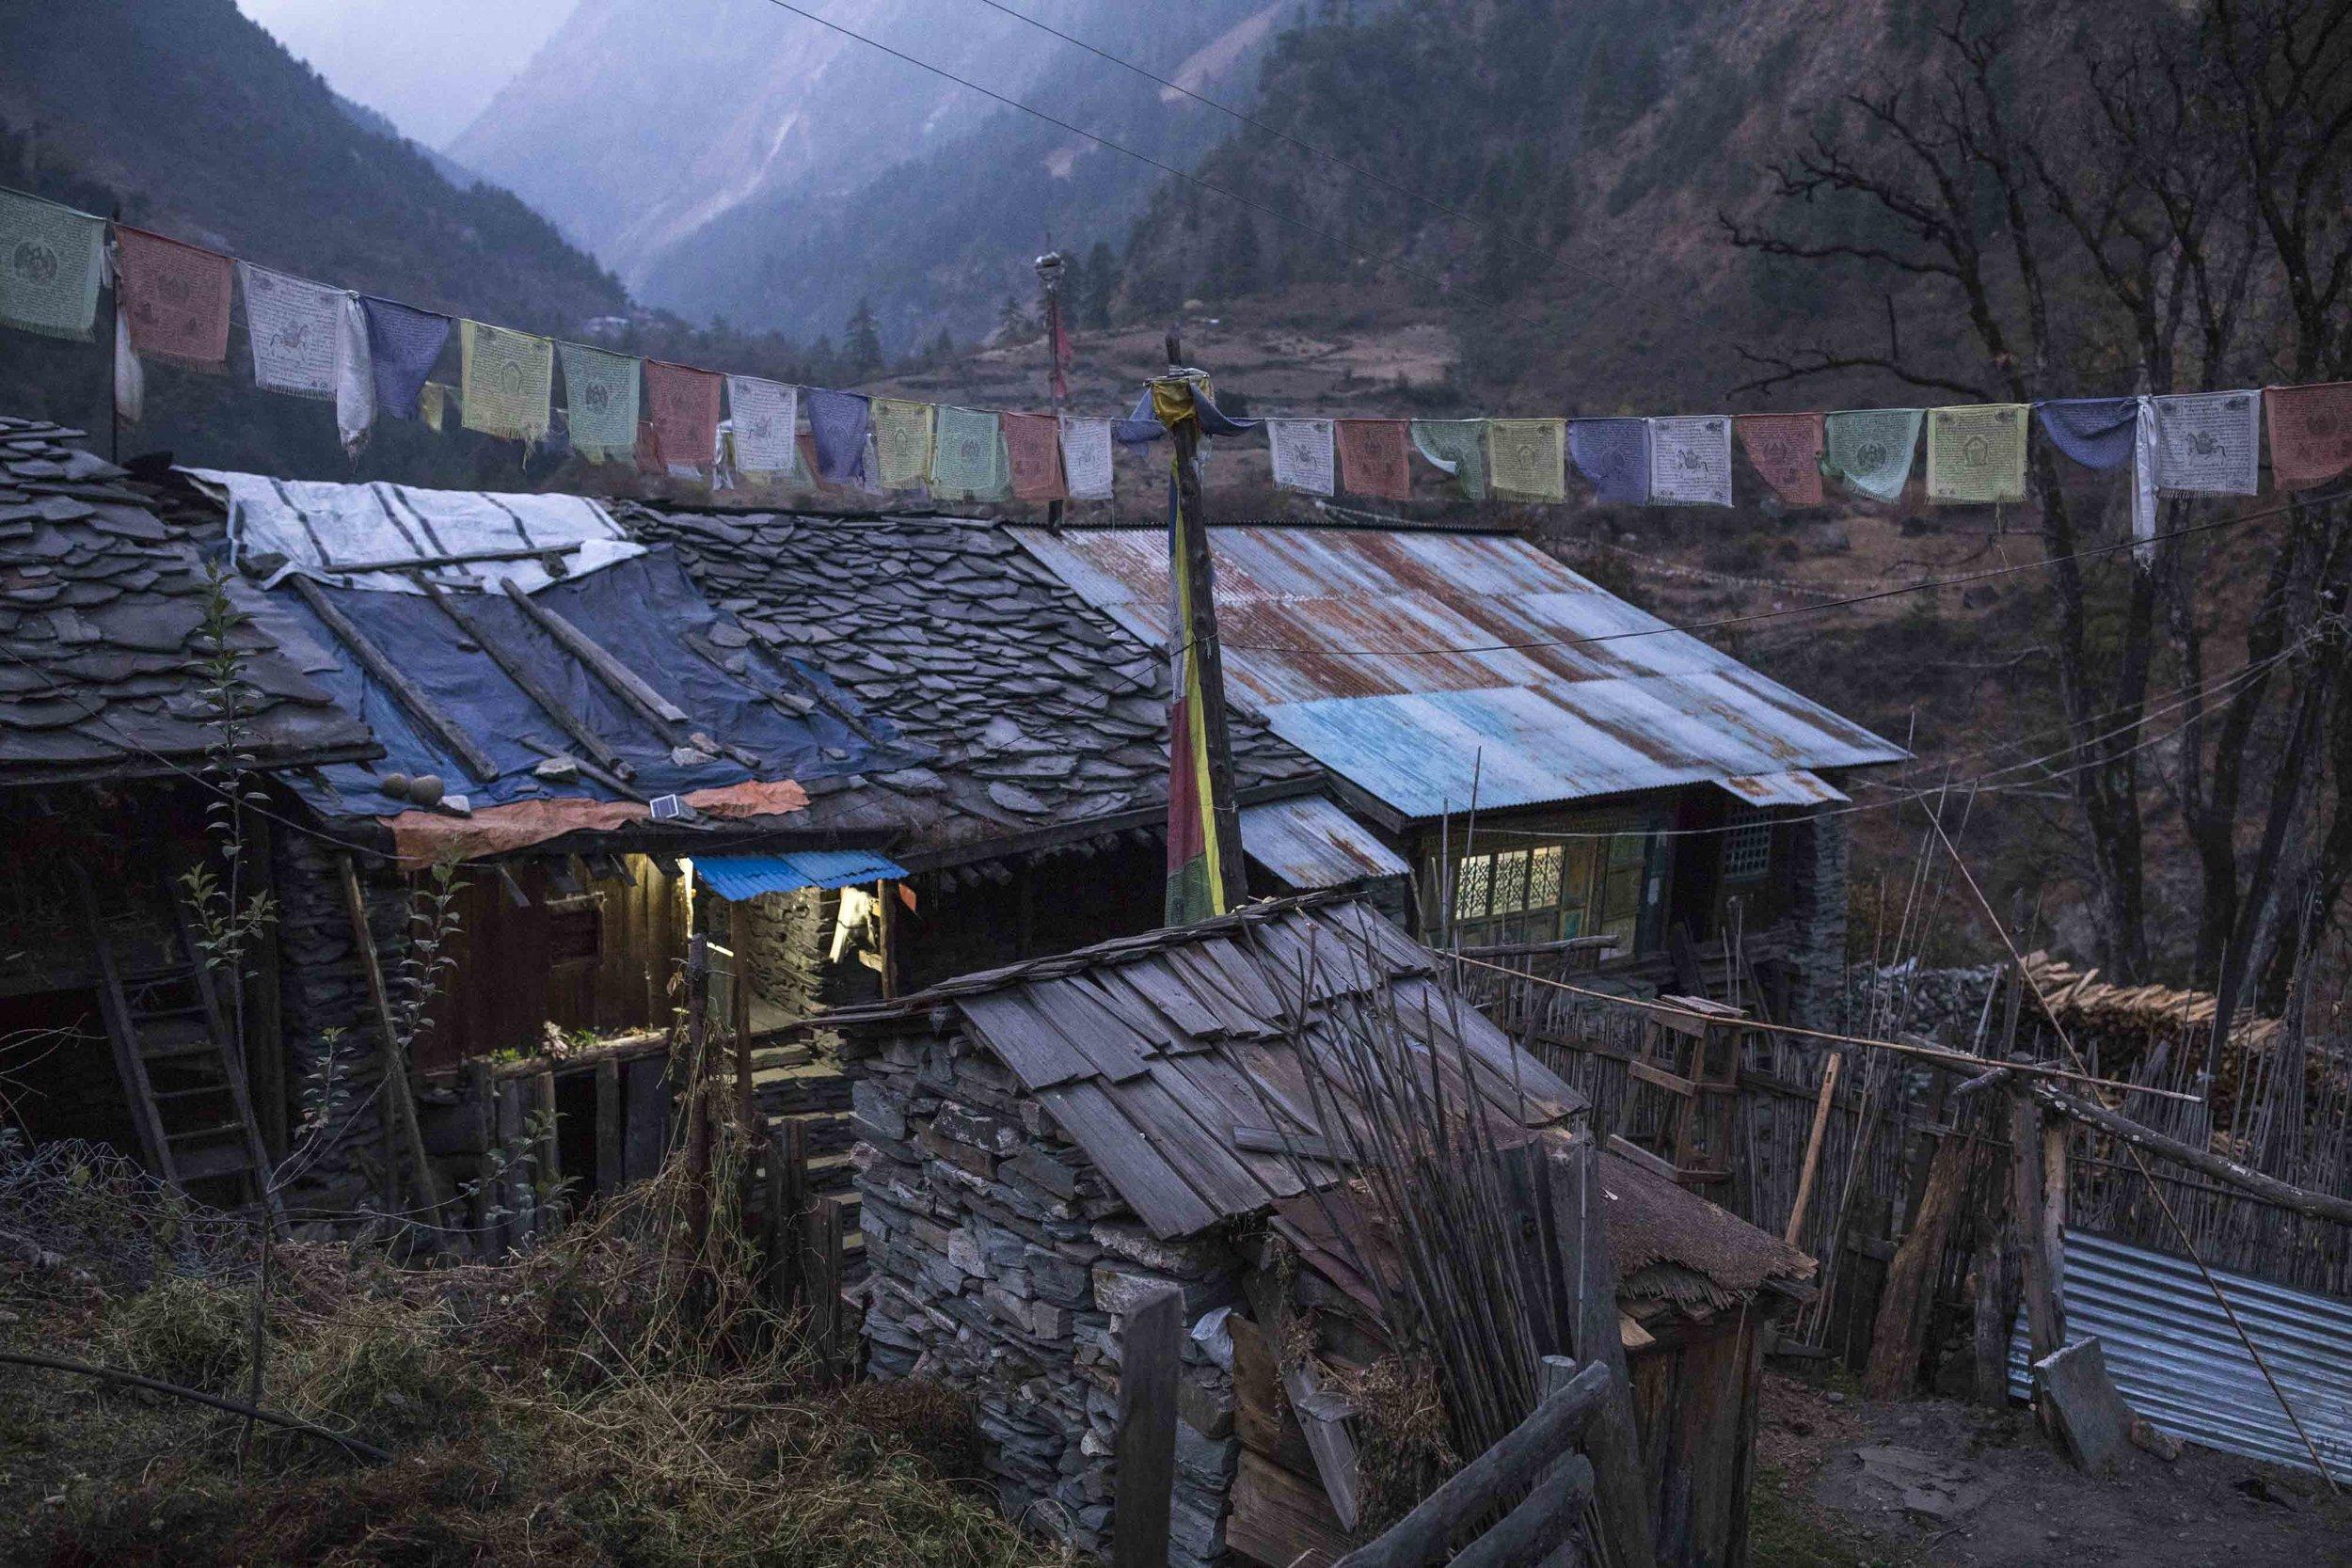 Tibetan settlement, Namrung in Nupri valley Nepal.